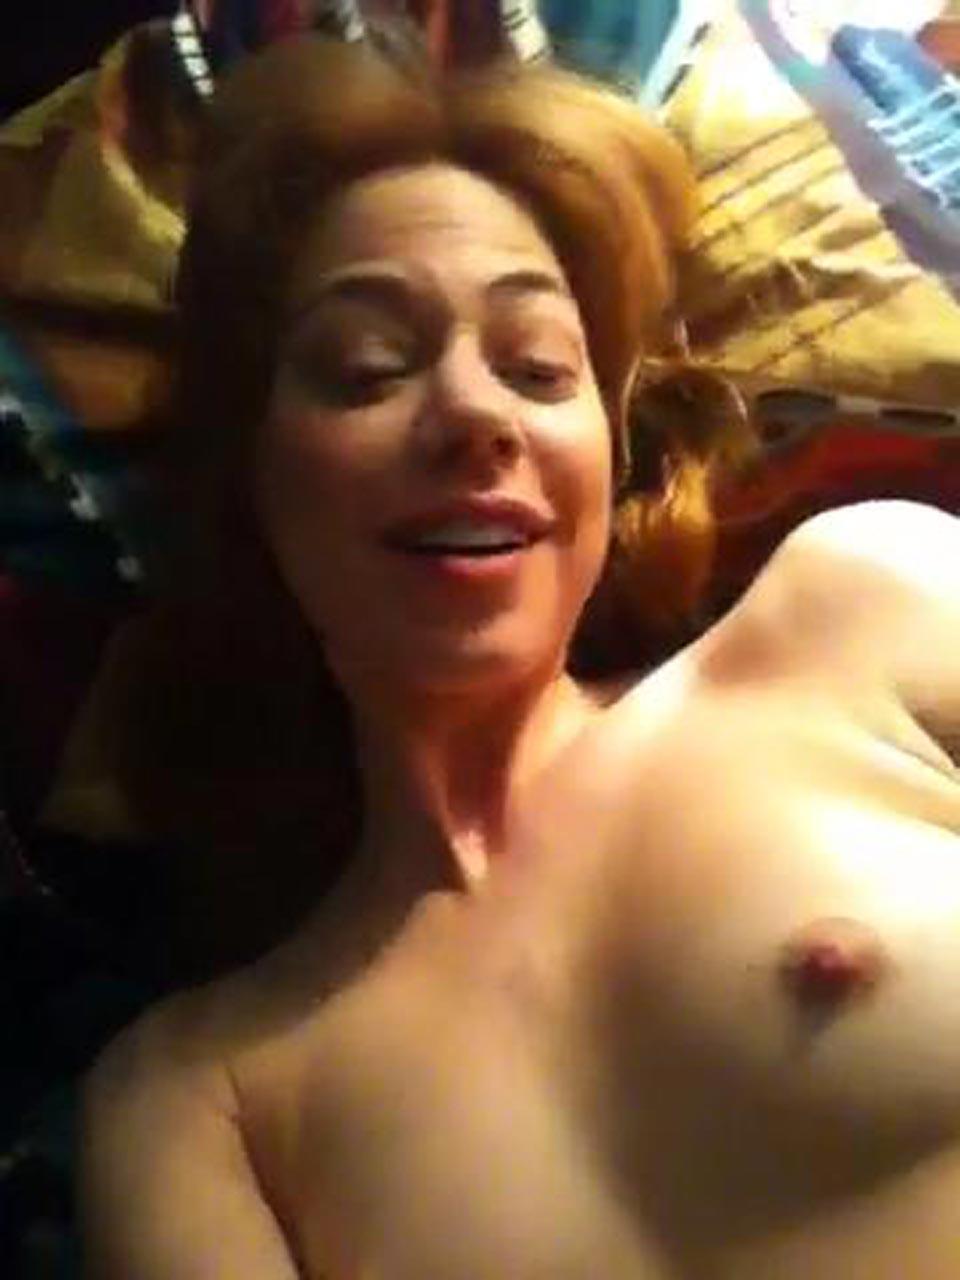 Analeigh Tipton Sex analeigh tipton masturbation leaked cellphone video